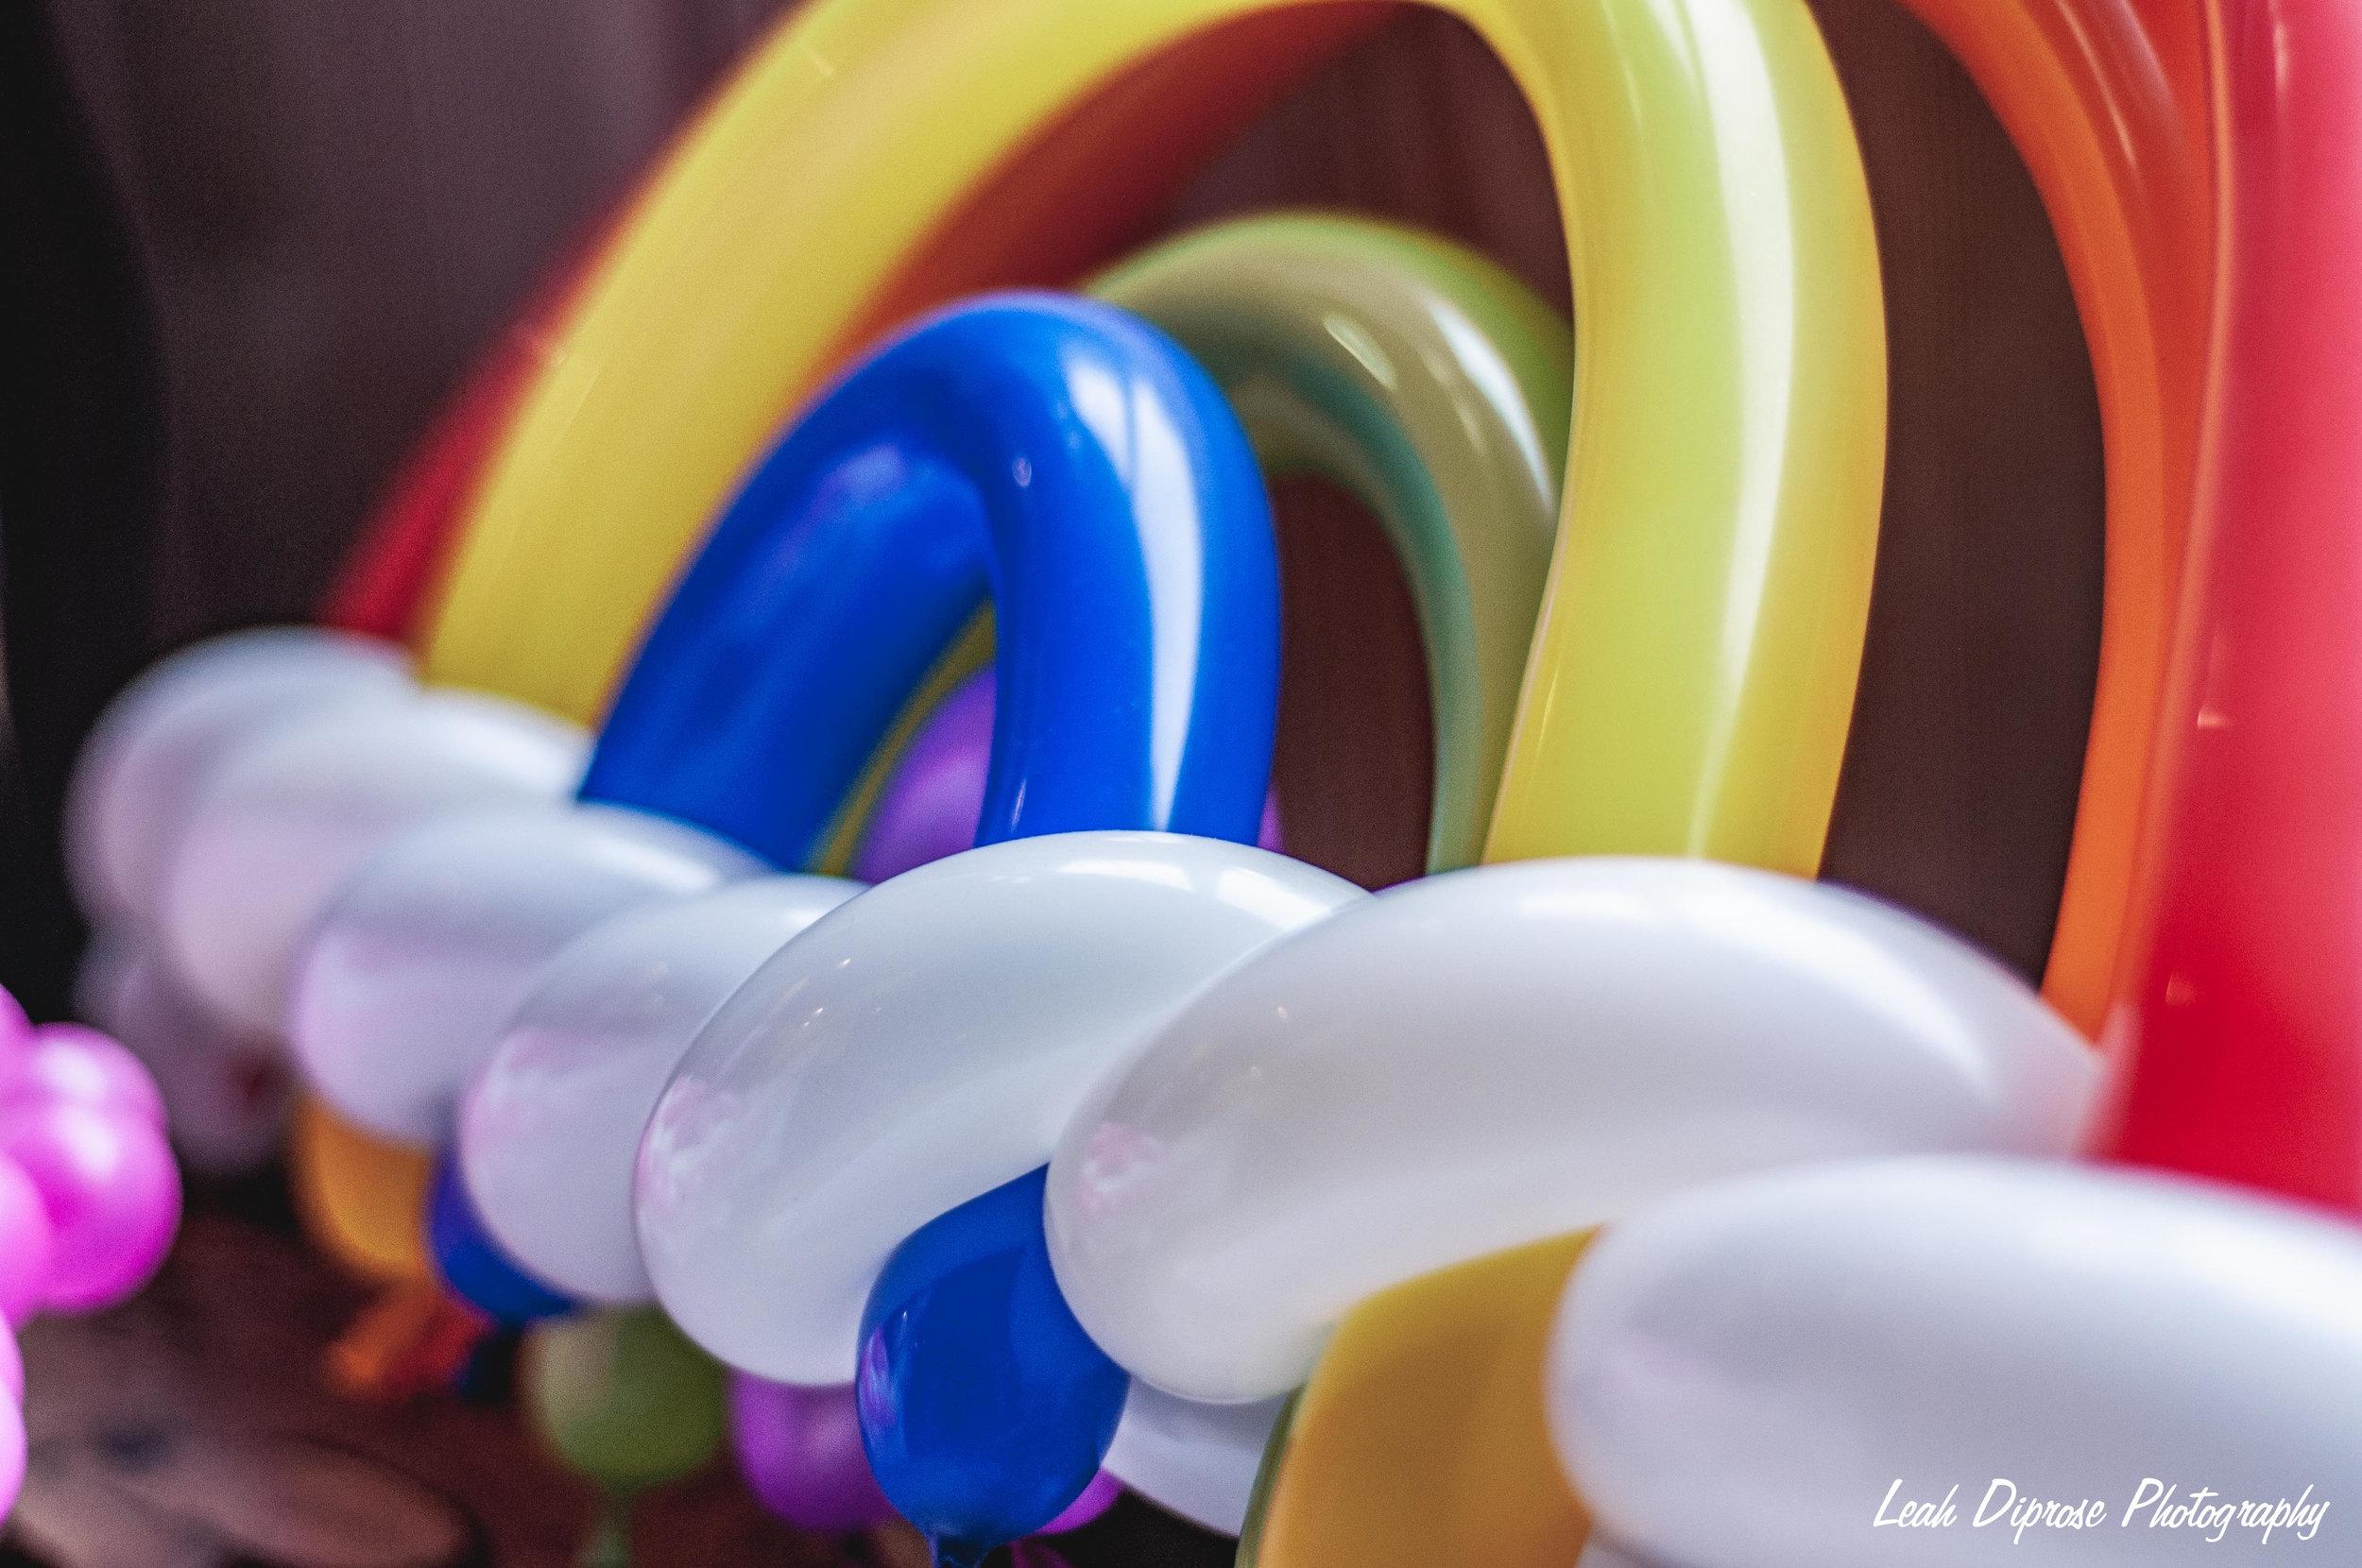 Leah Diprose Photography image-6704.jpg